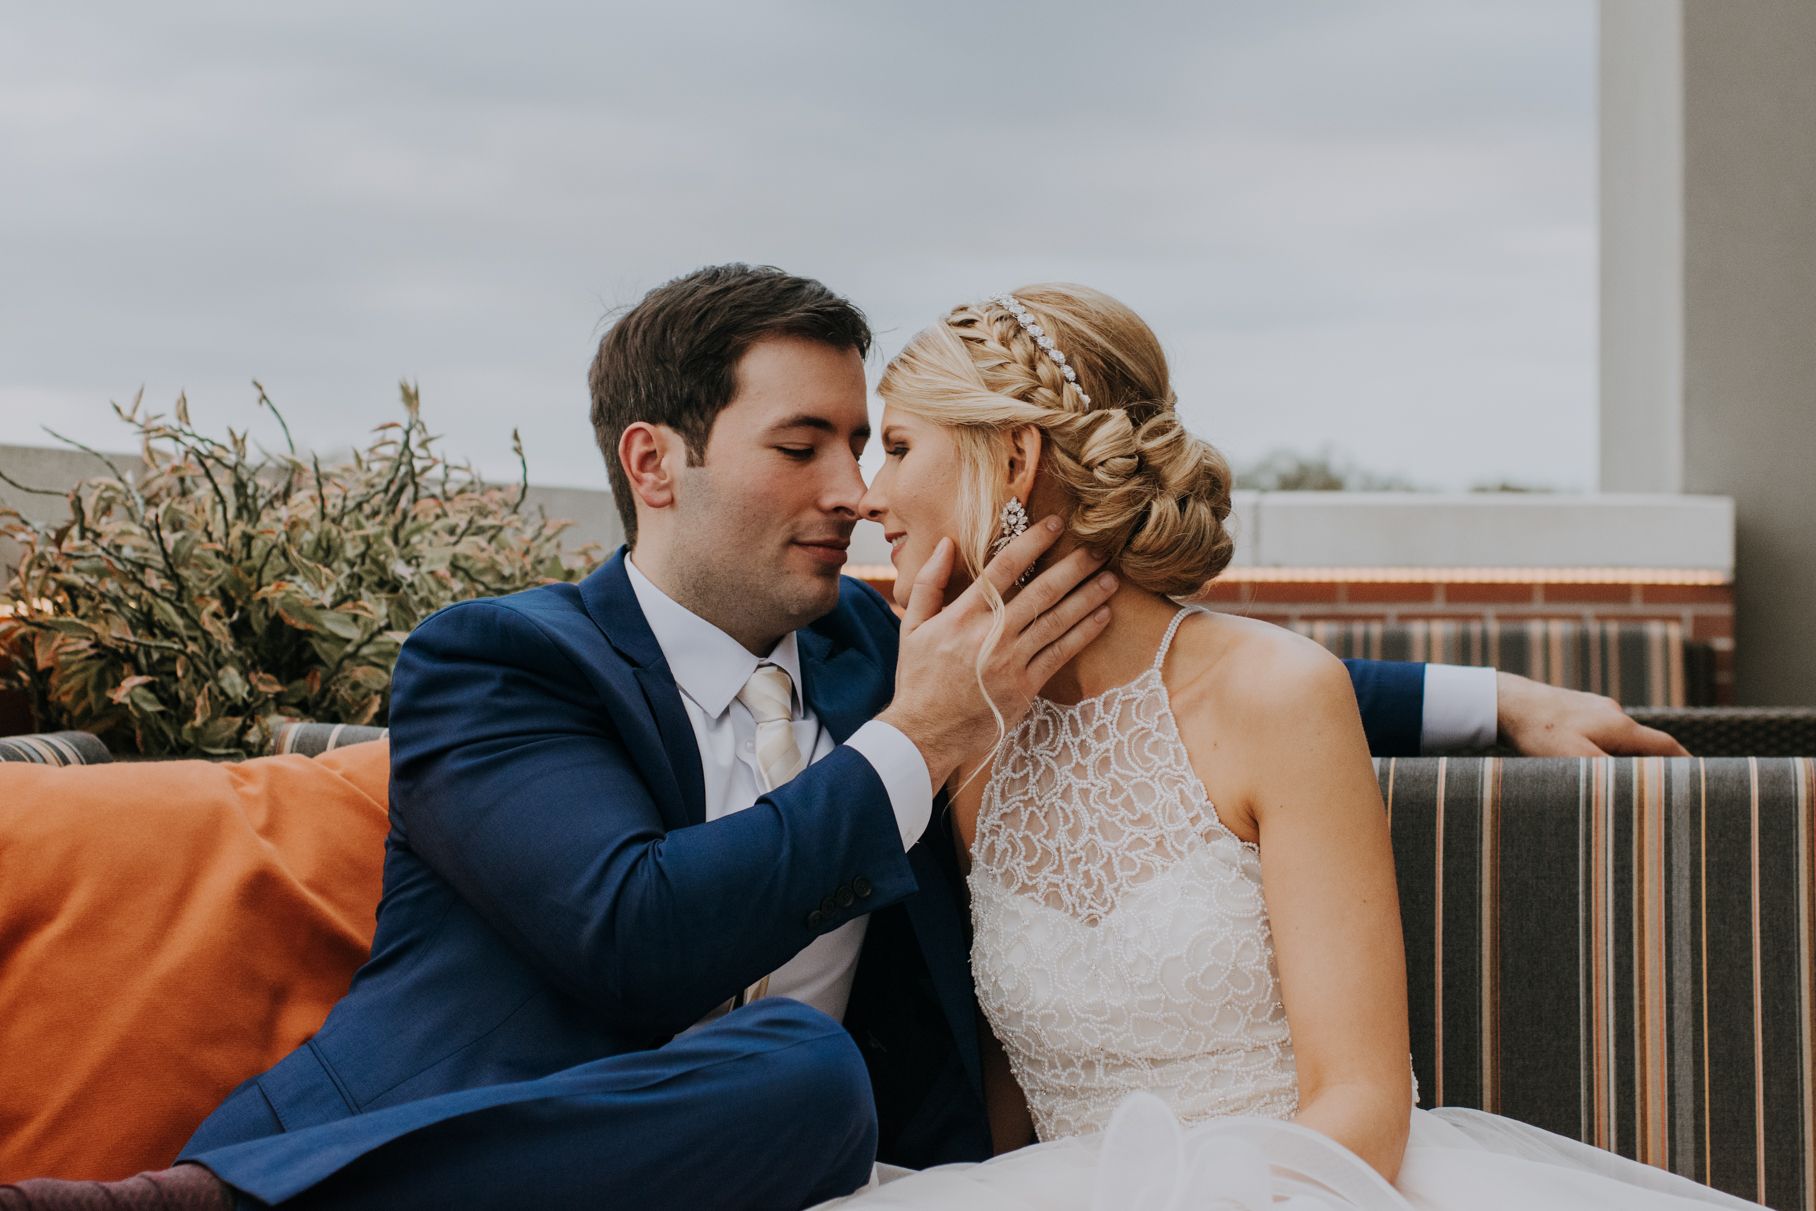 erin + brent   epicurean hotel wedding